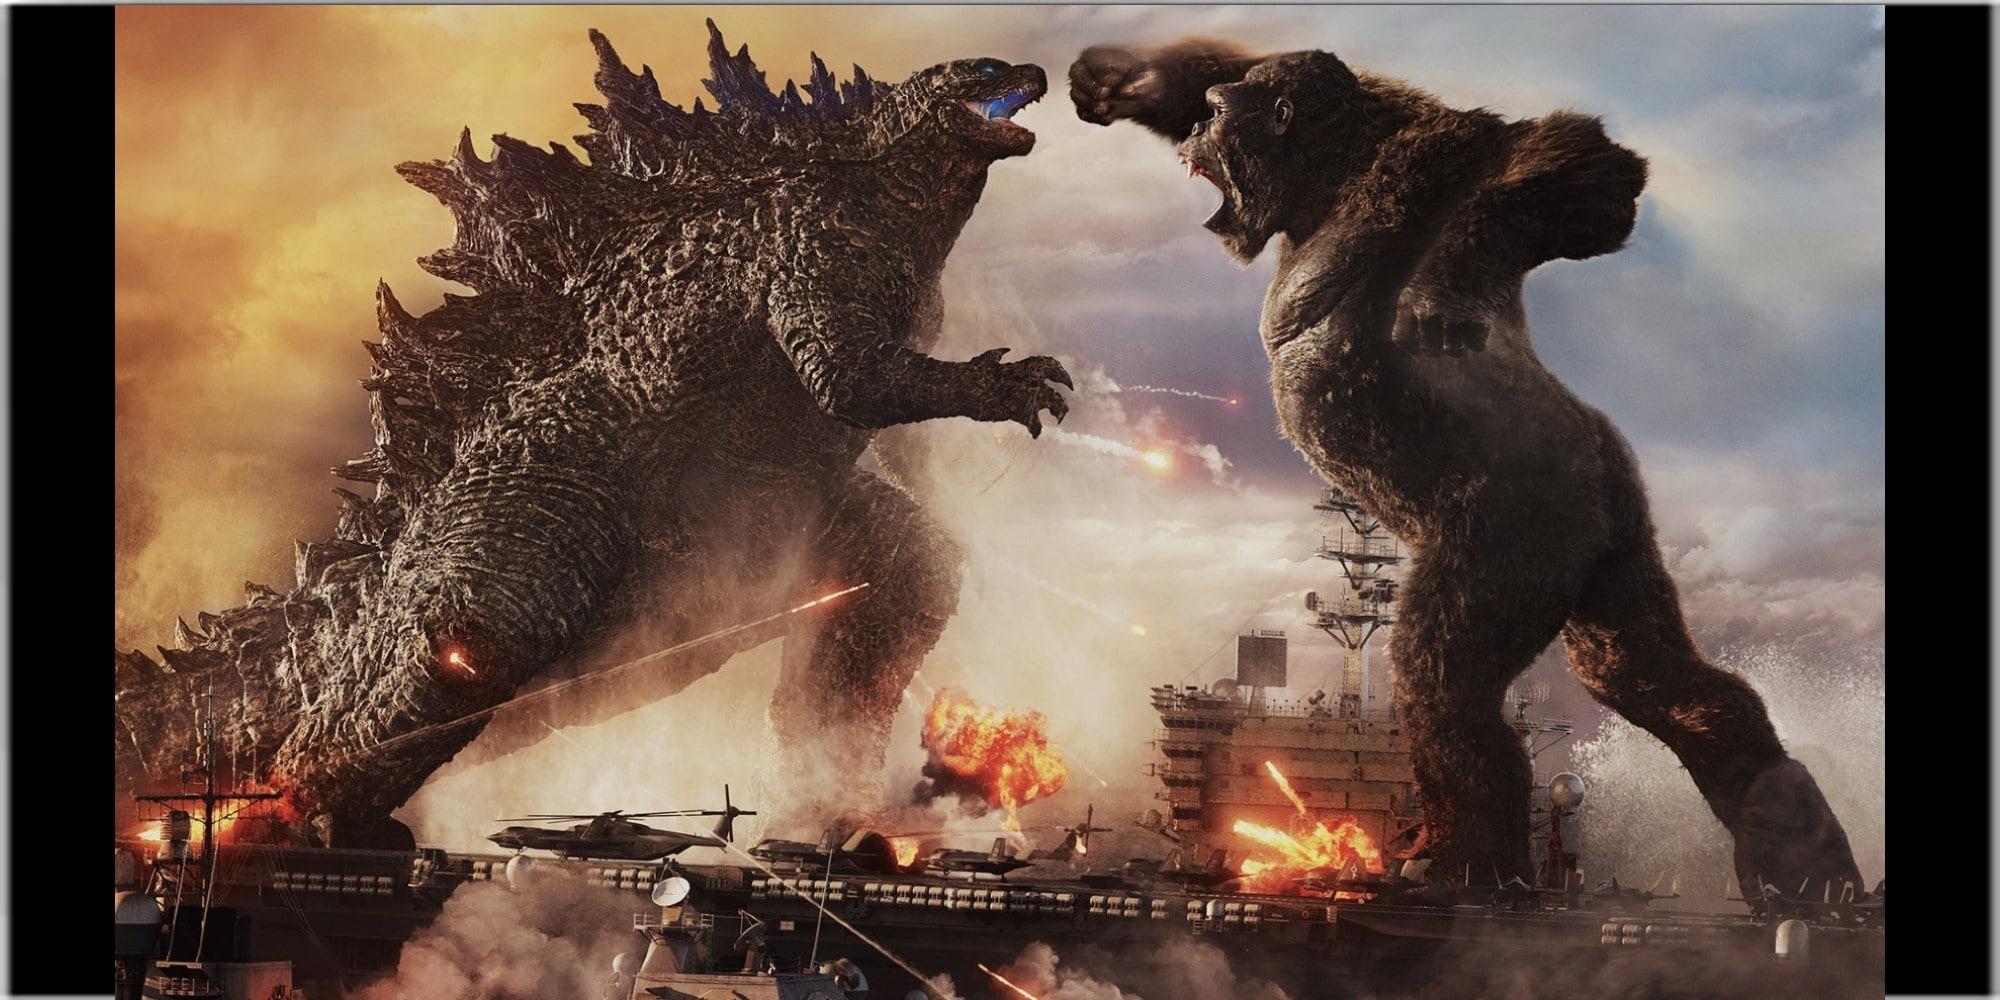 Godzilla vs Kong [Movie Review]